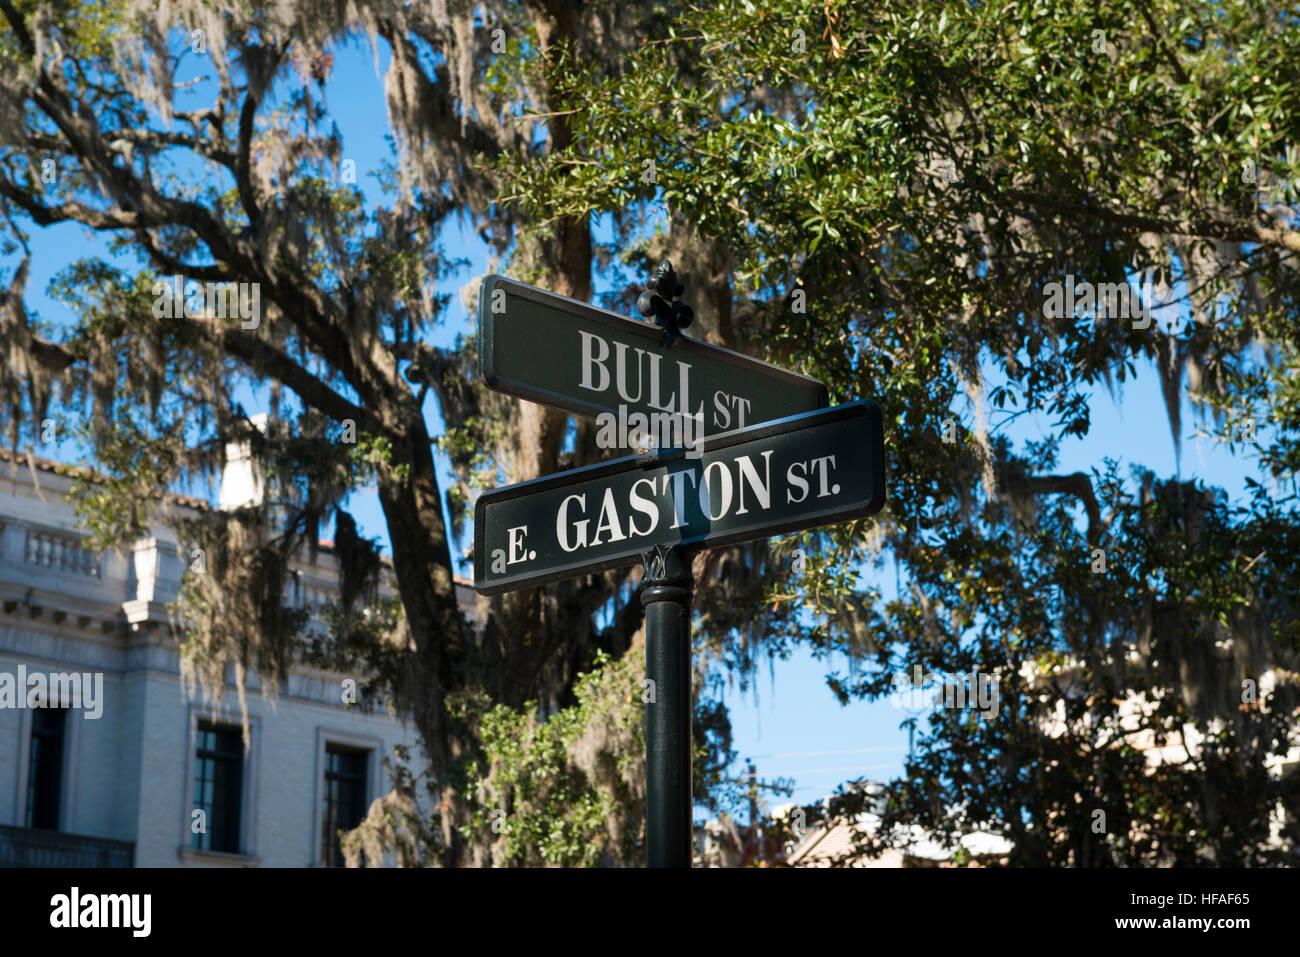 USA Georgia Savannah typical road signs Bull & E Gaston Street trees with Spanish Moss - Stock Image